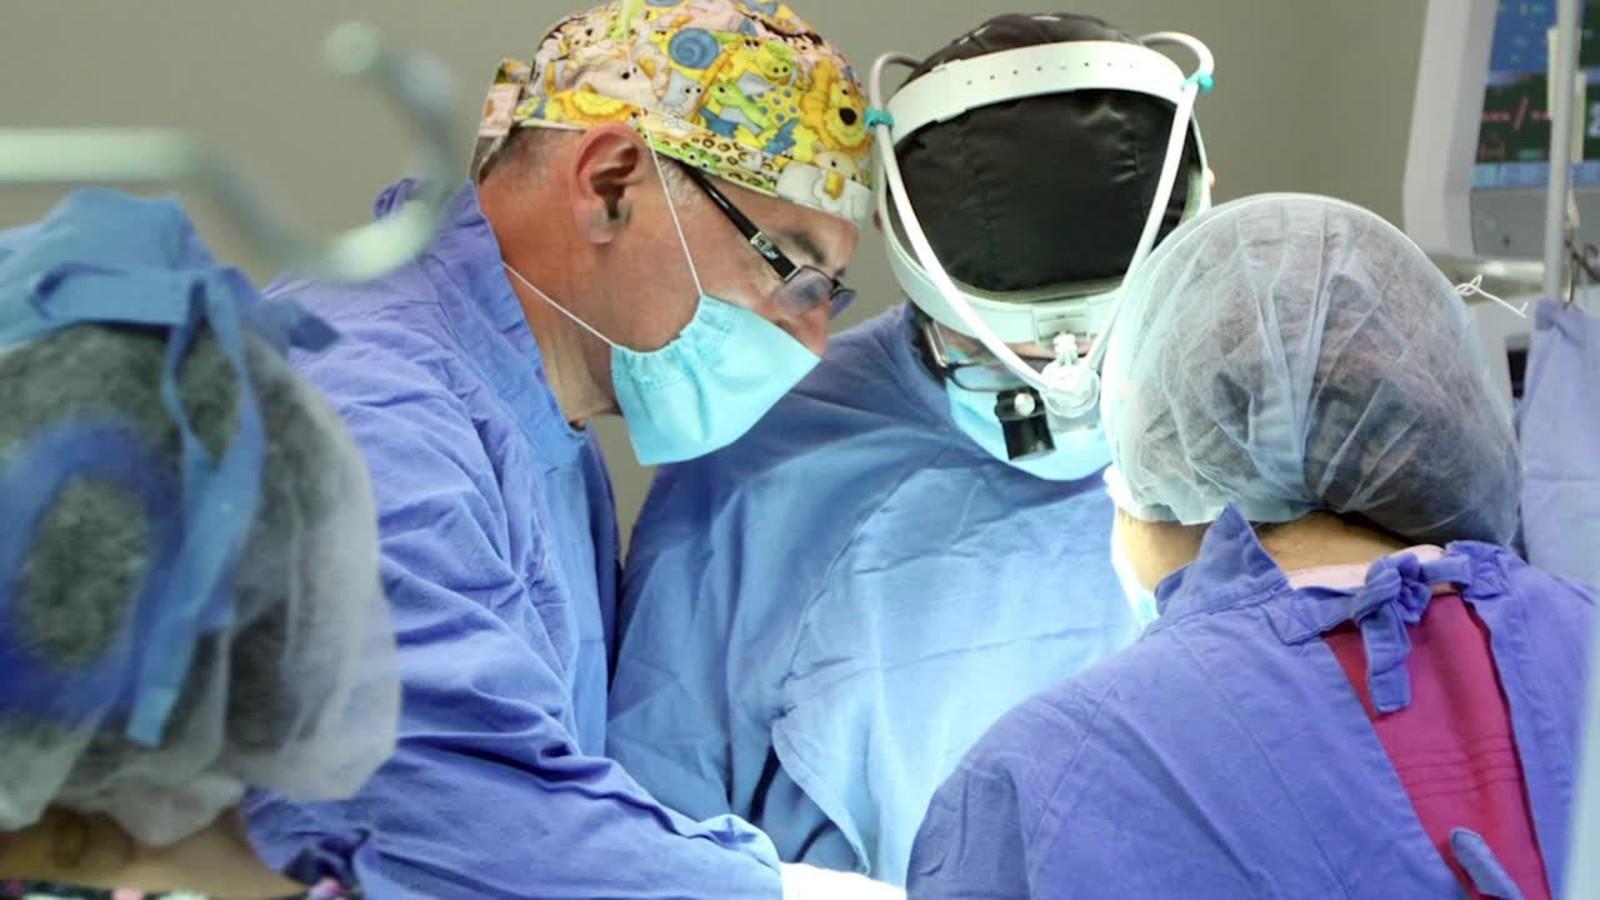 CirujanosmexicanosoperaronelcorazondeunaninaduranteelterremotoCNNEspanolcom